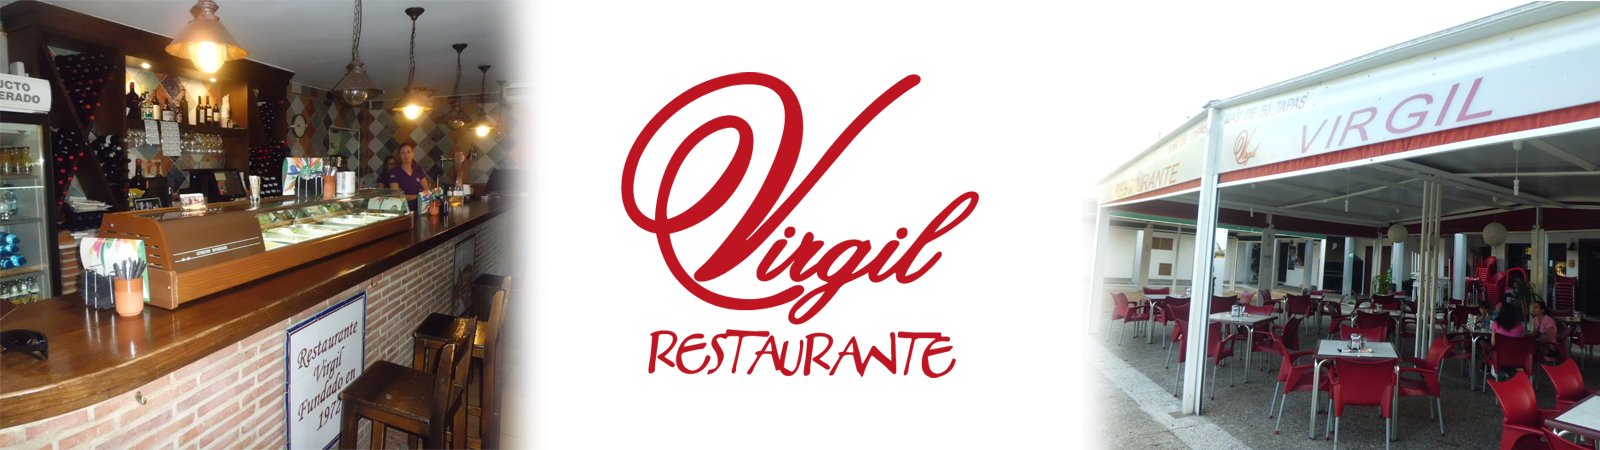 Restaurante Virgil, restaurante el virgil, el virgil, virgil, restaurante castellar, castellar